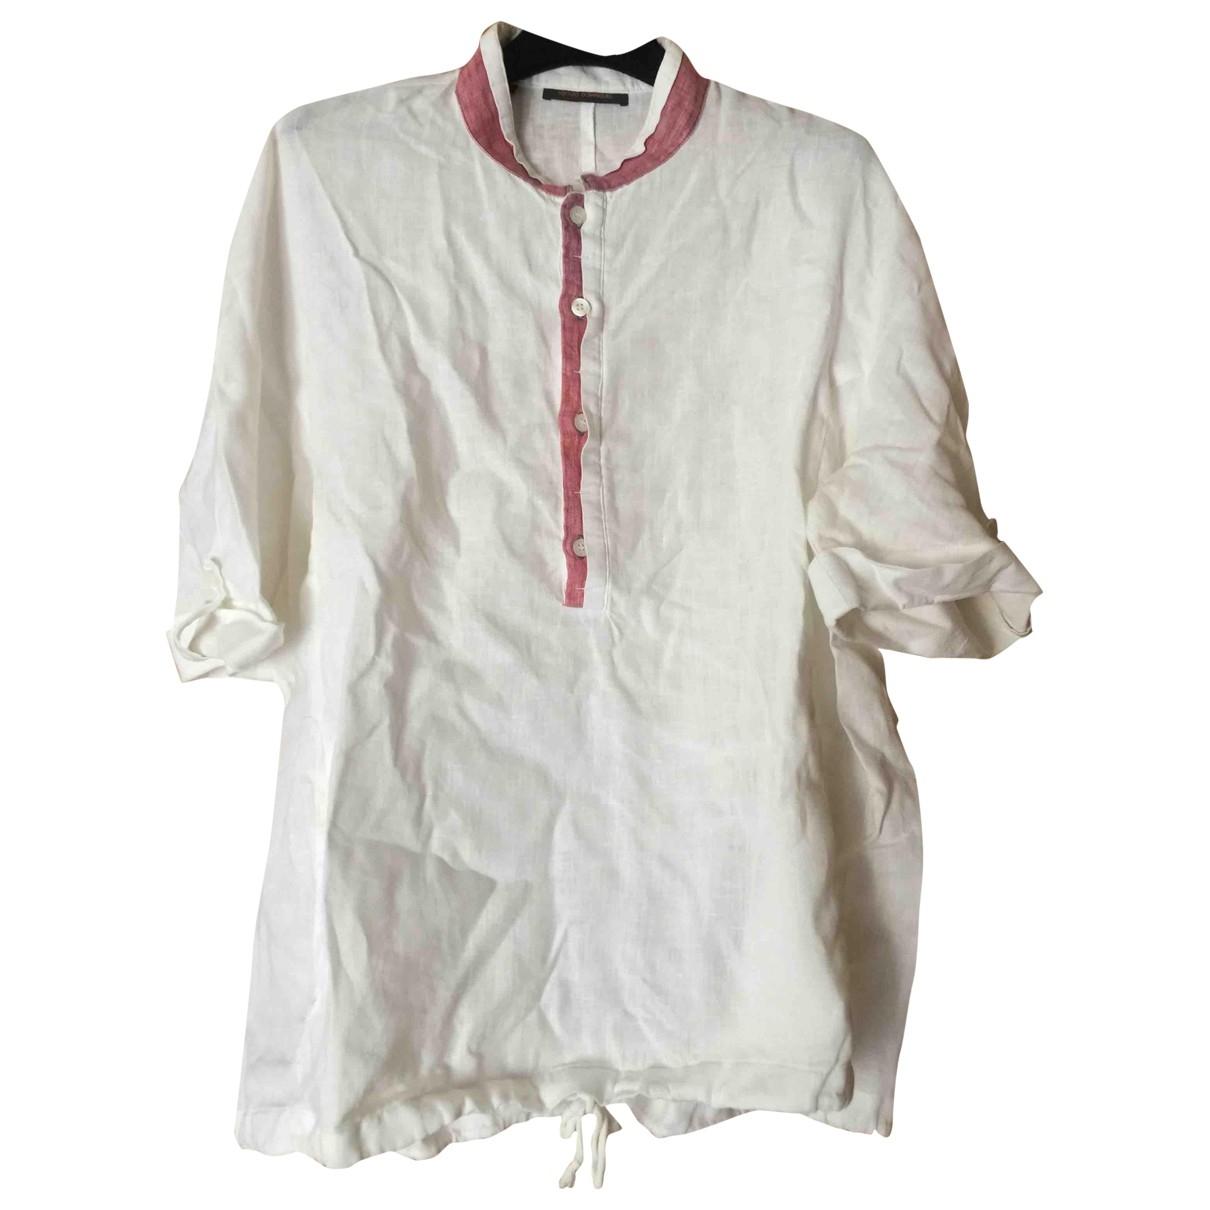 Adolfo Dominguez \N White Linen Shirts for Men M International